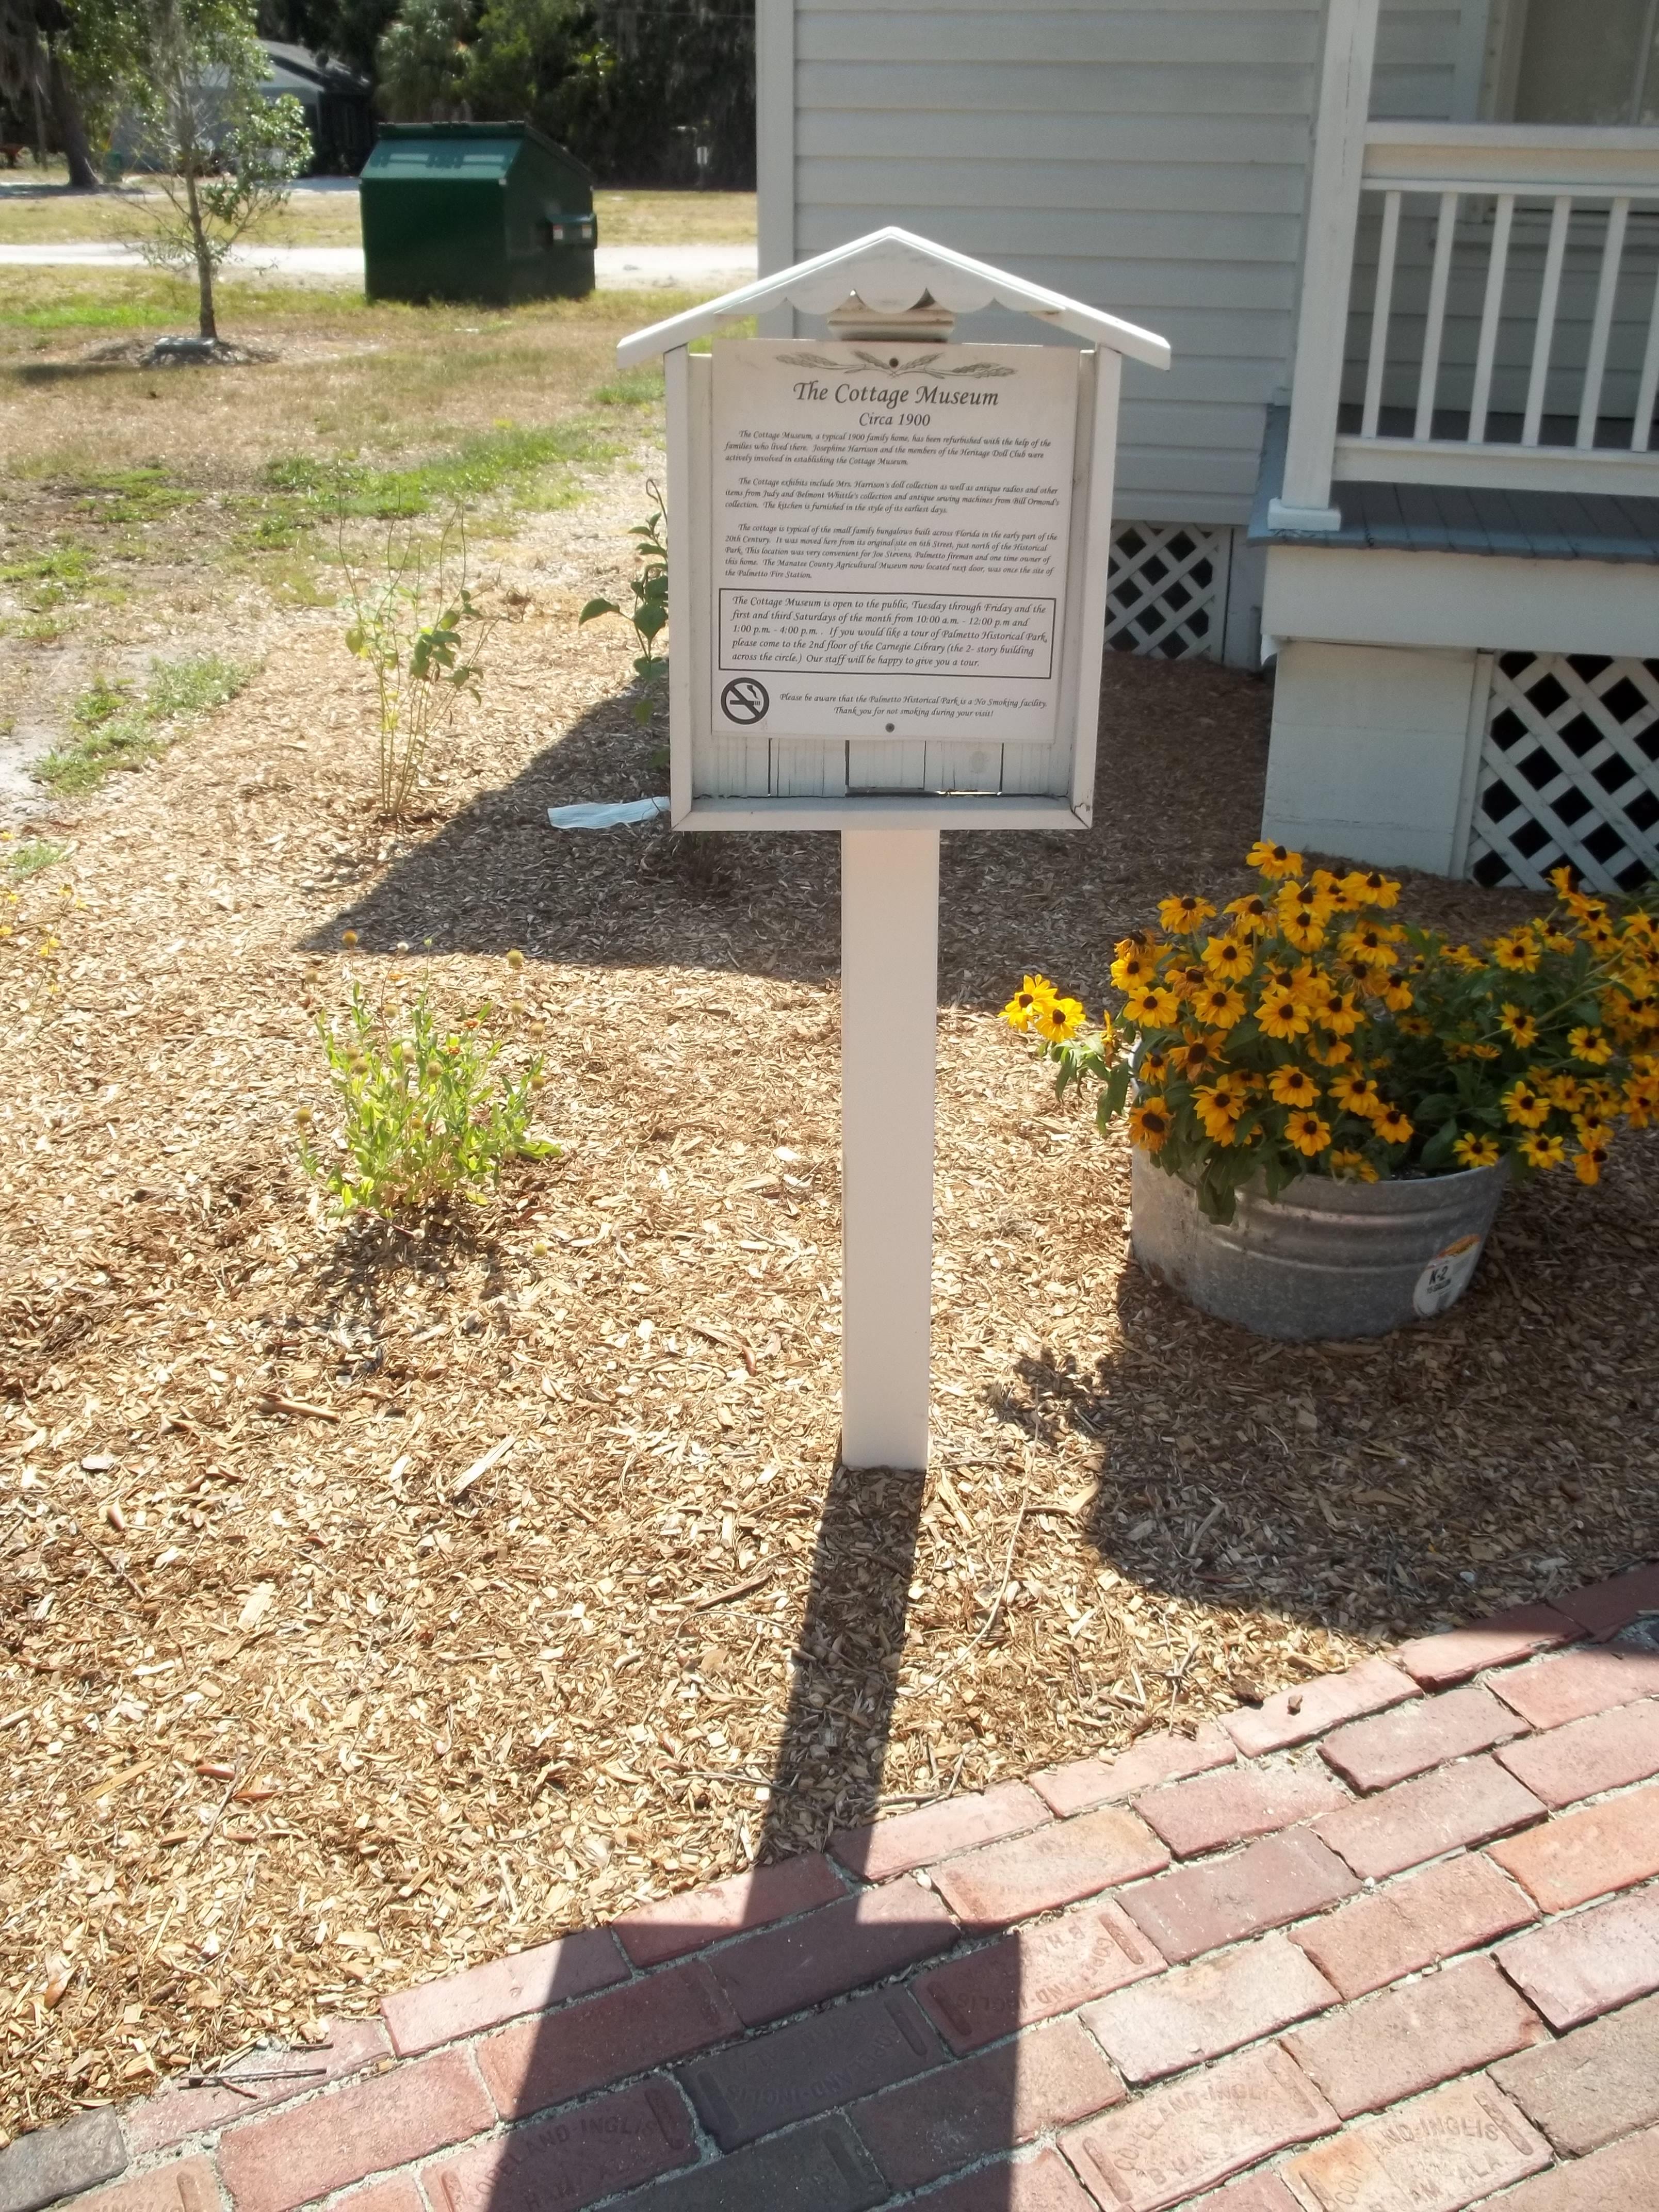 File:Palmetto FL HD Hist Park Cottage msm marker01 jpg - Wikimedia